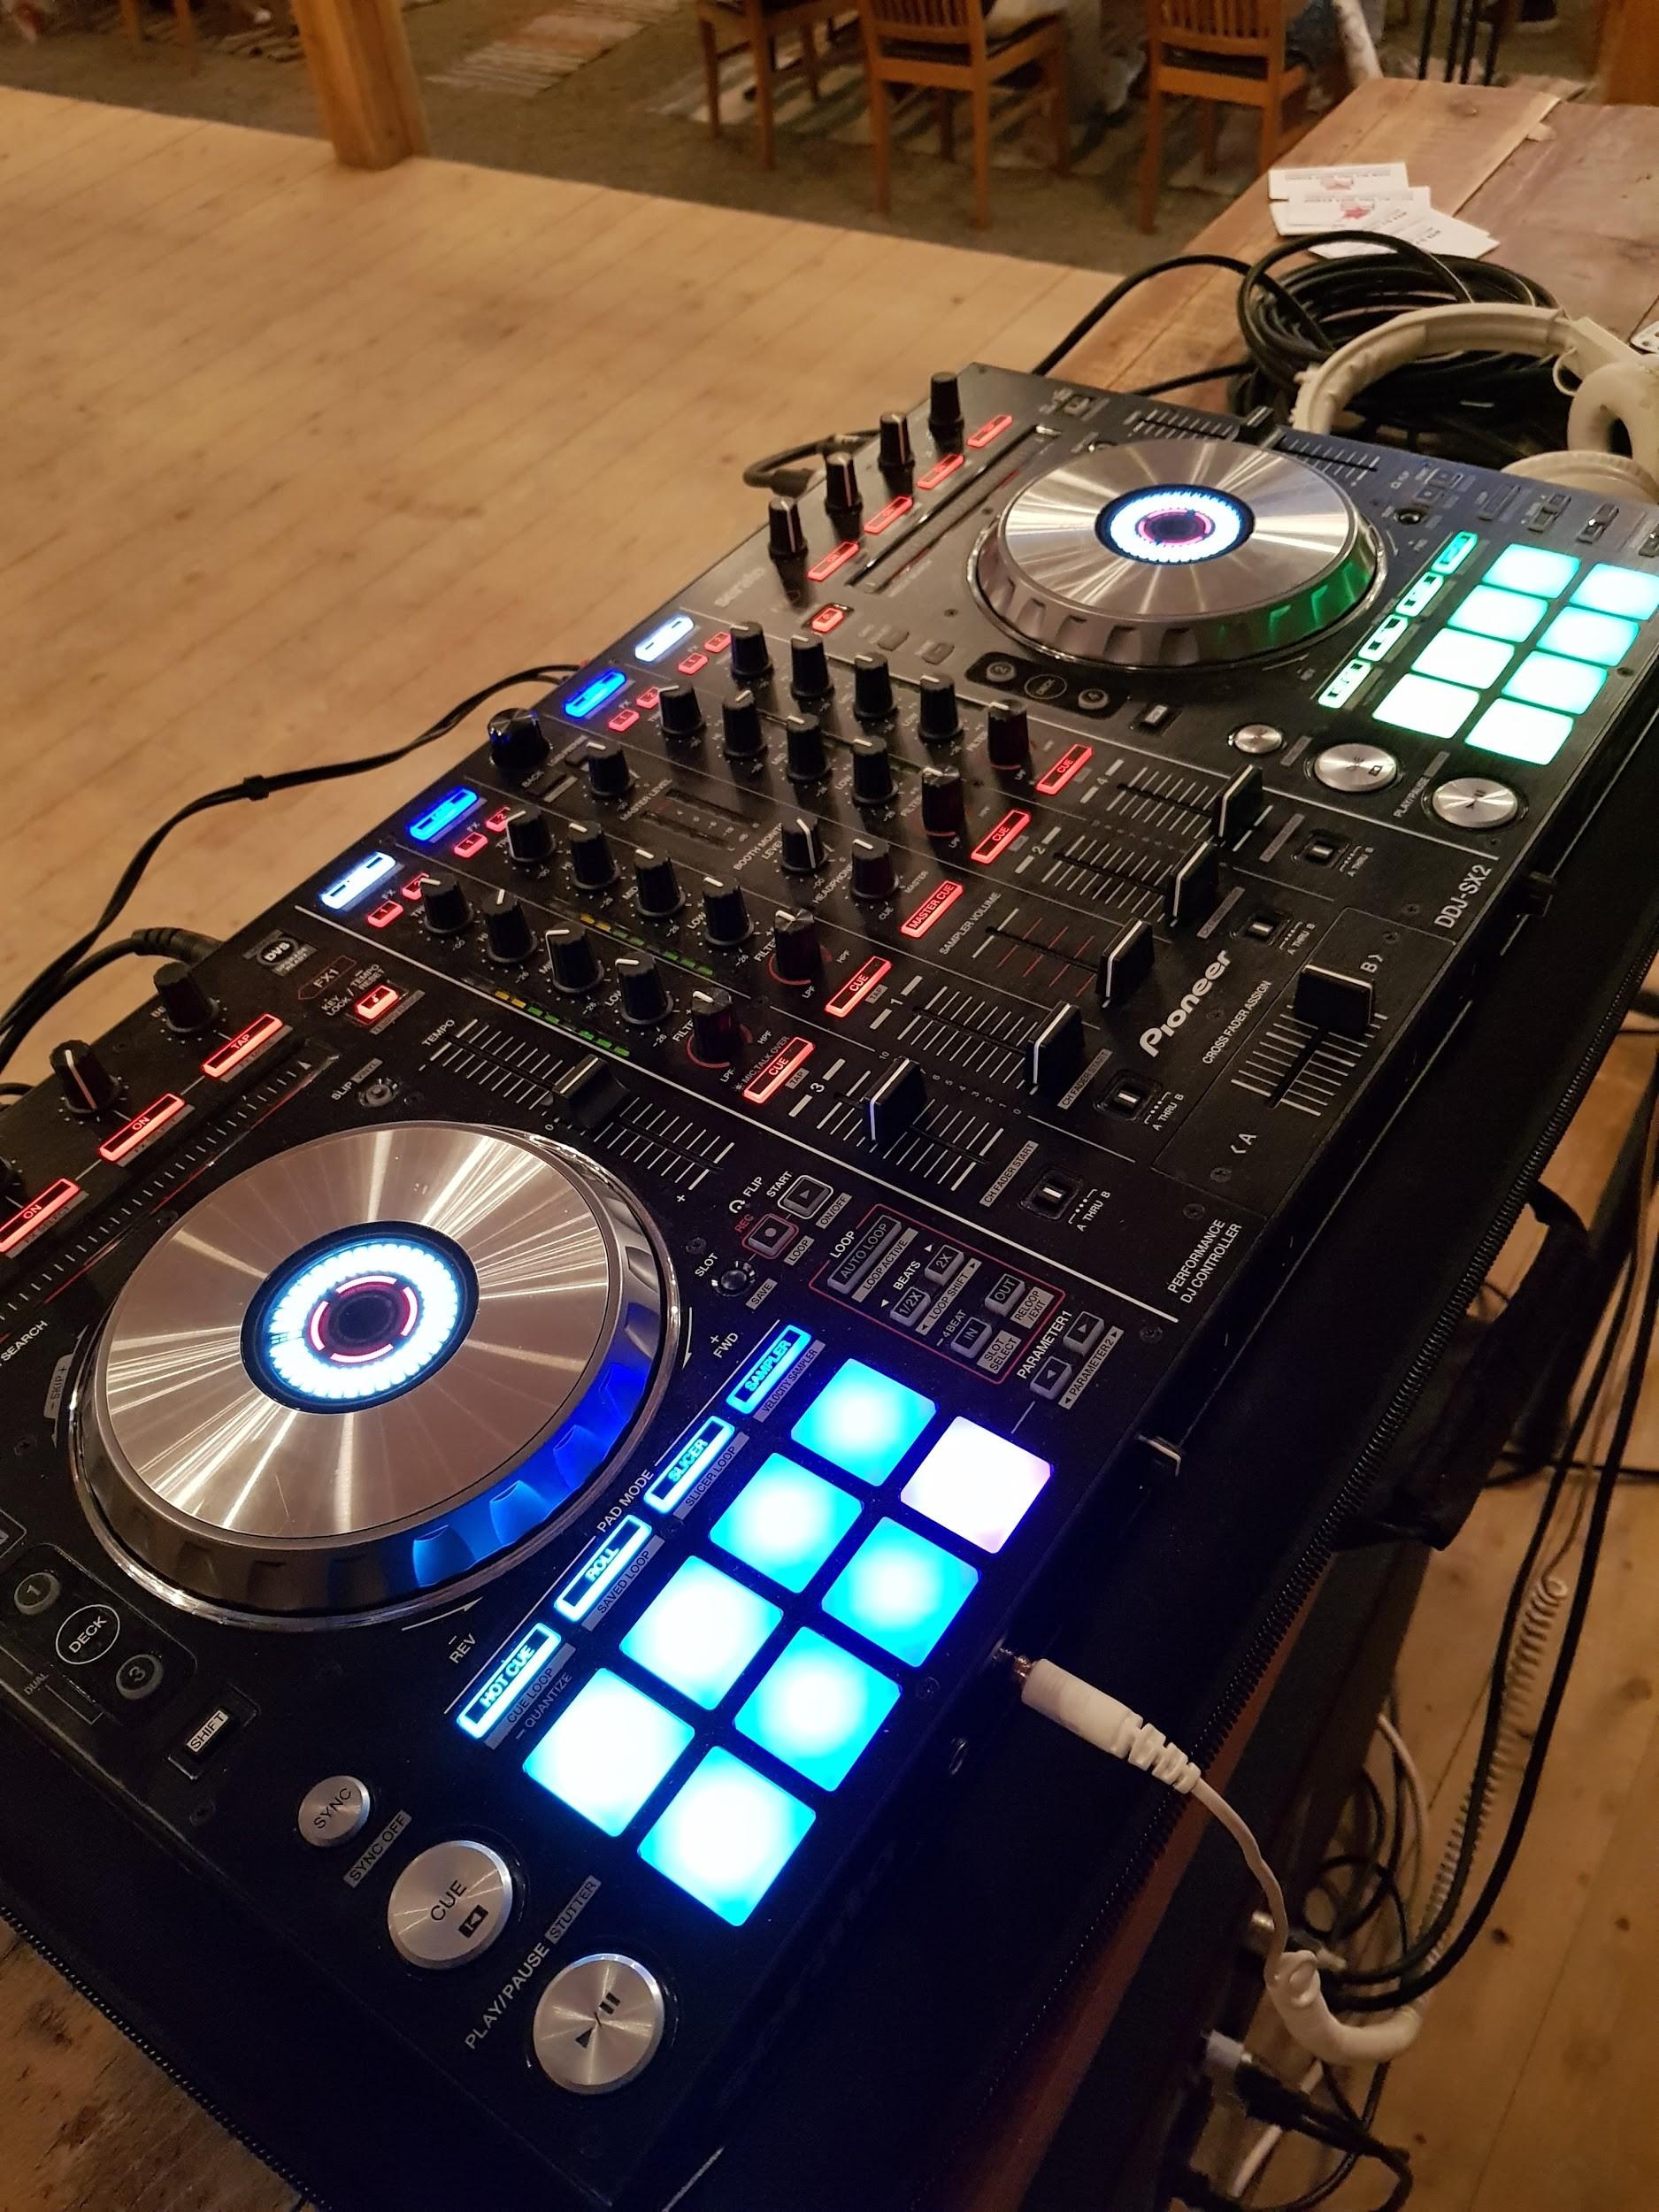 boka_dj_hyr_dj_utrustning